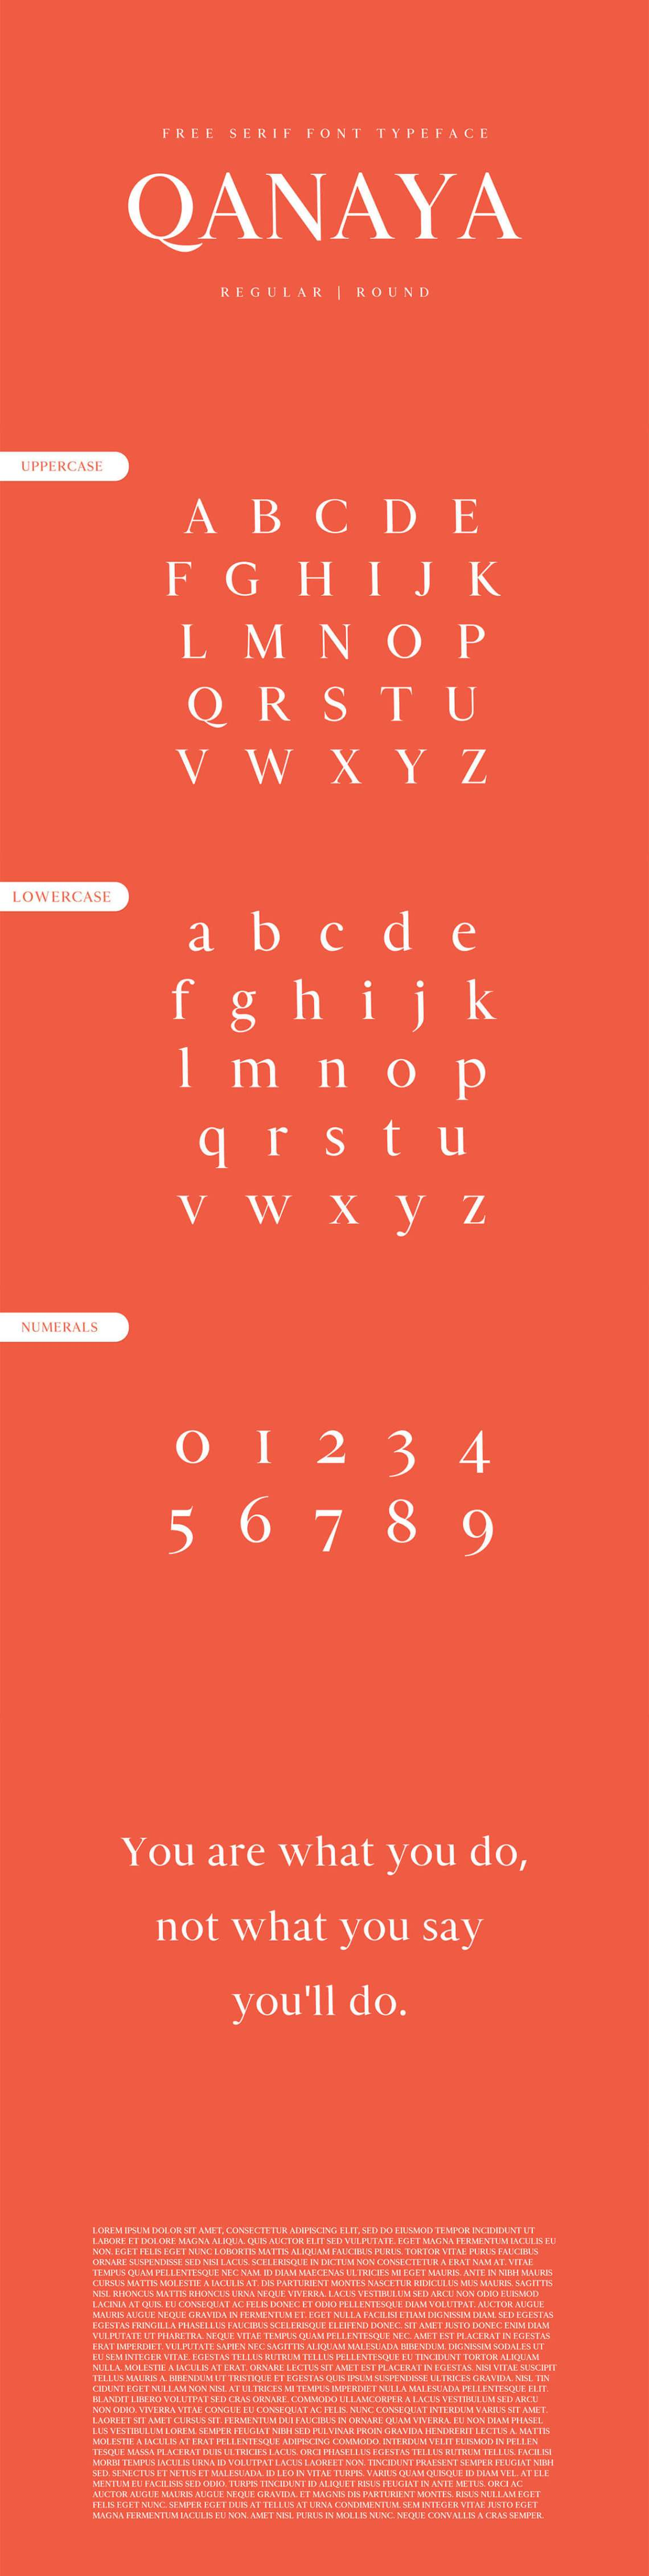 Download Free Qanaya Serif Font Family Pack ~ Creativetacos